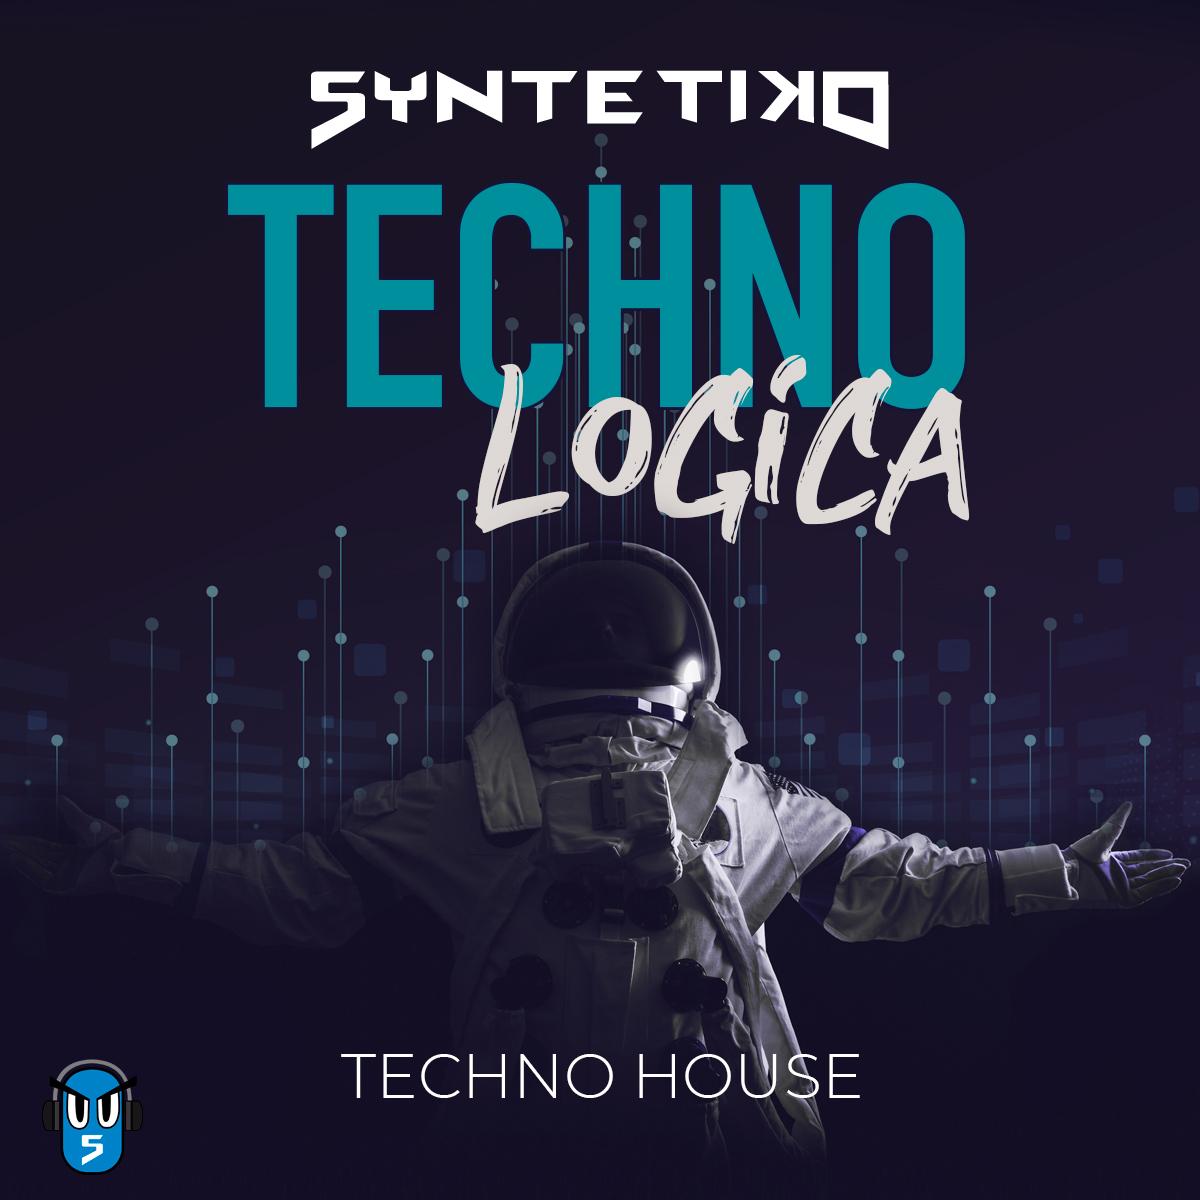 Technologica Jun 2020